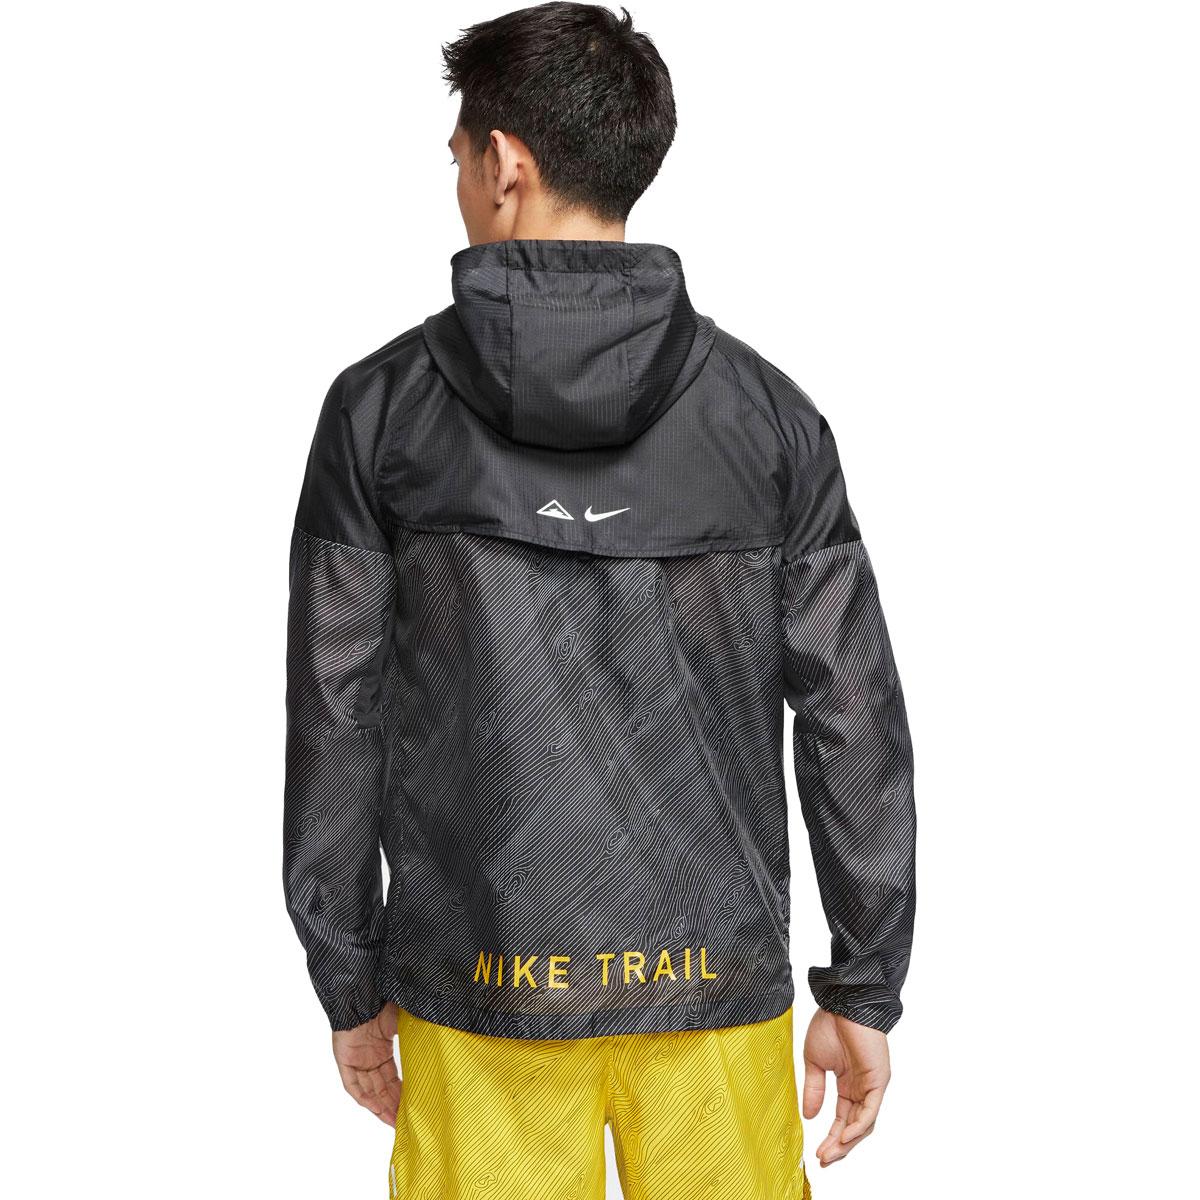 cocinar una comida Víspera de Todos los Santos Adviento  Nike Windrunner Hooded Trail Running Jacket | JackRabbit